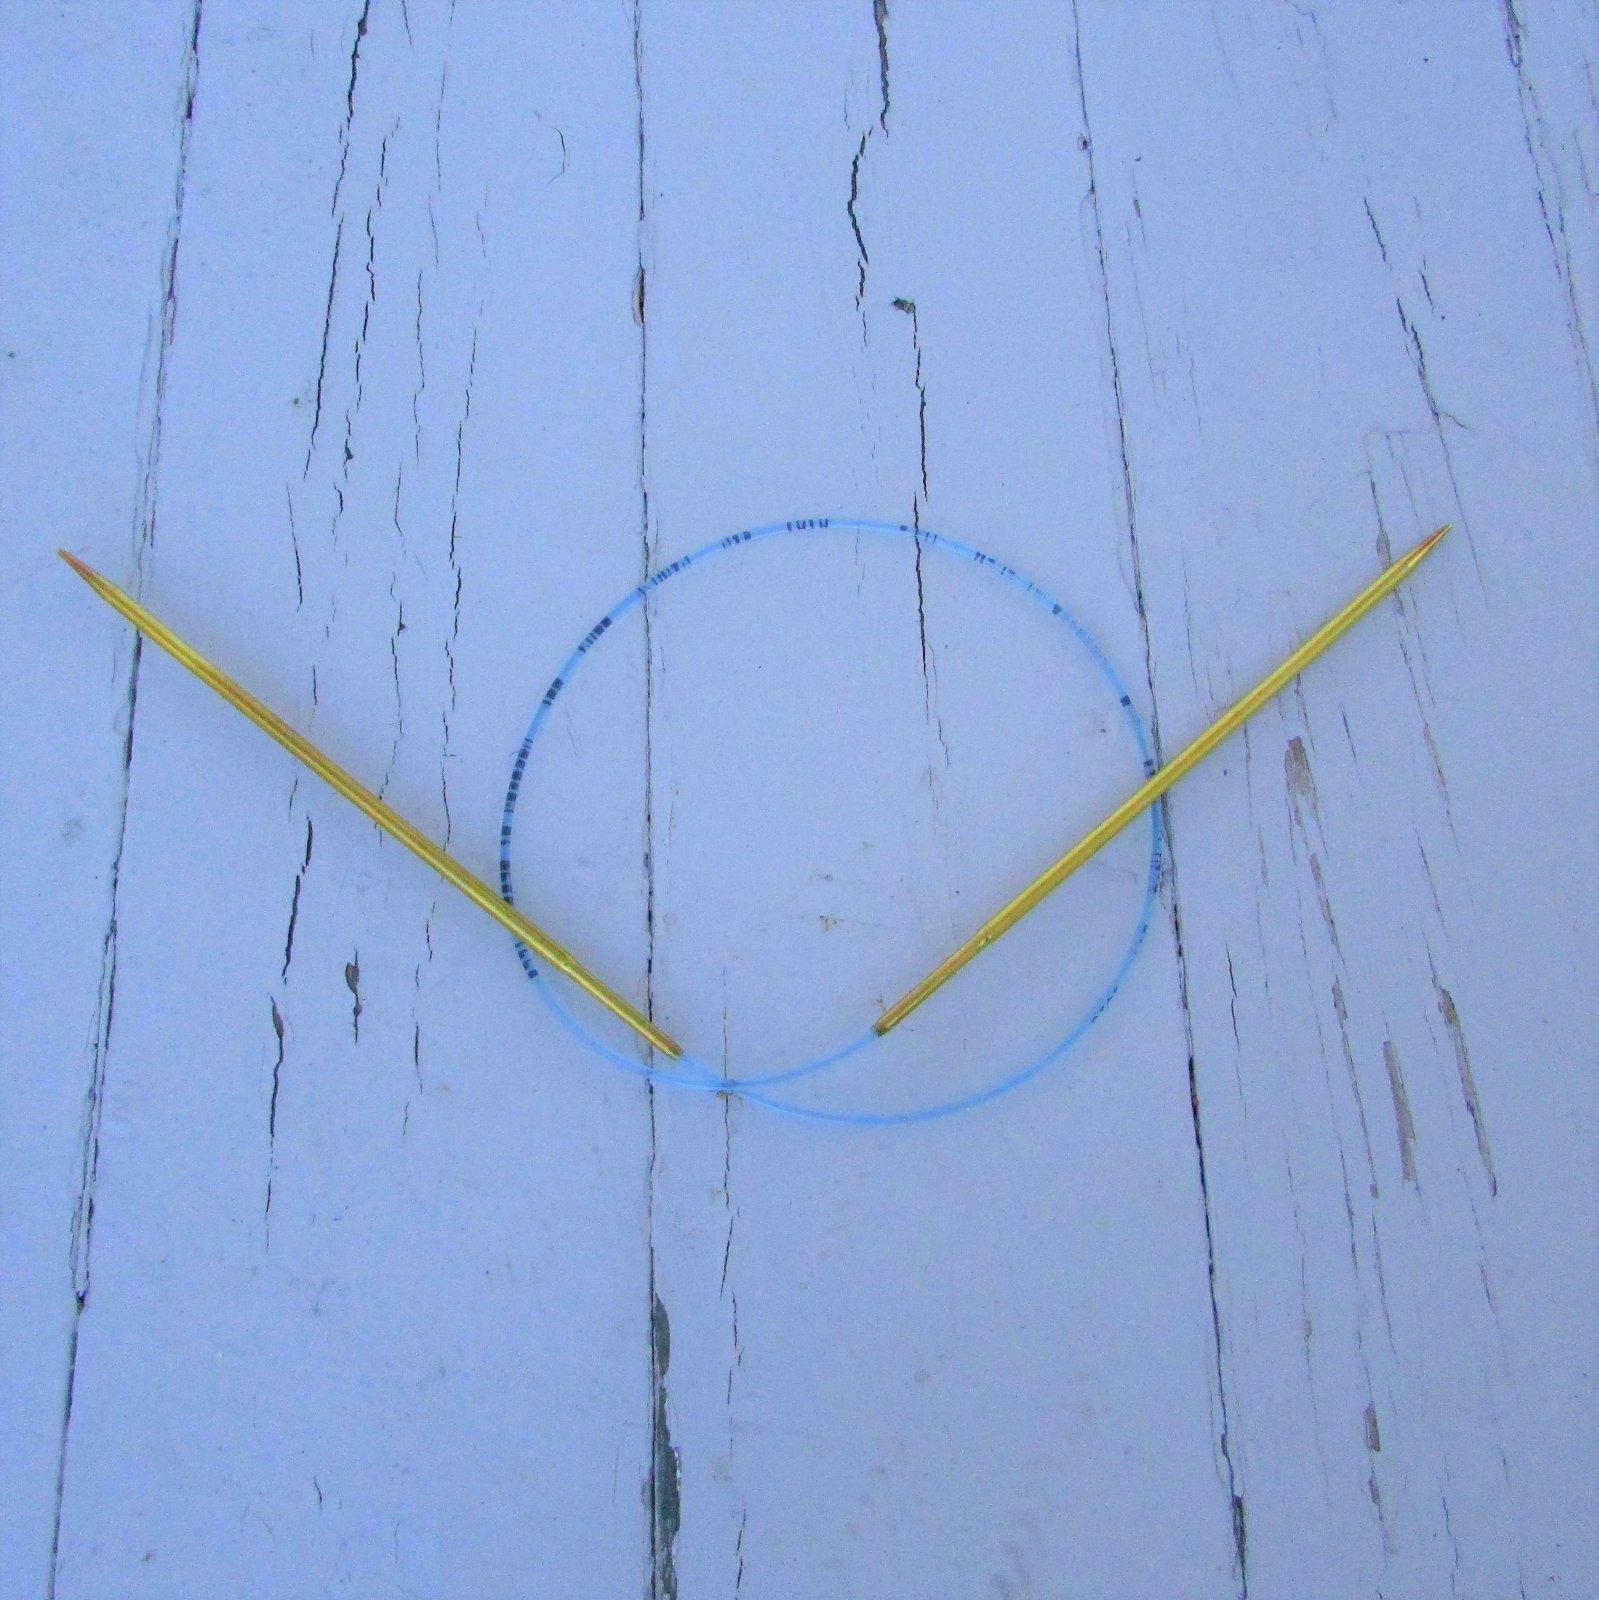 Addi Lace 24 Circular Needles